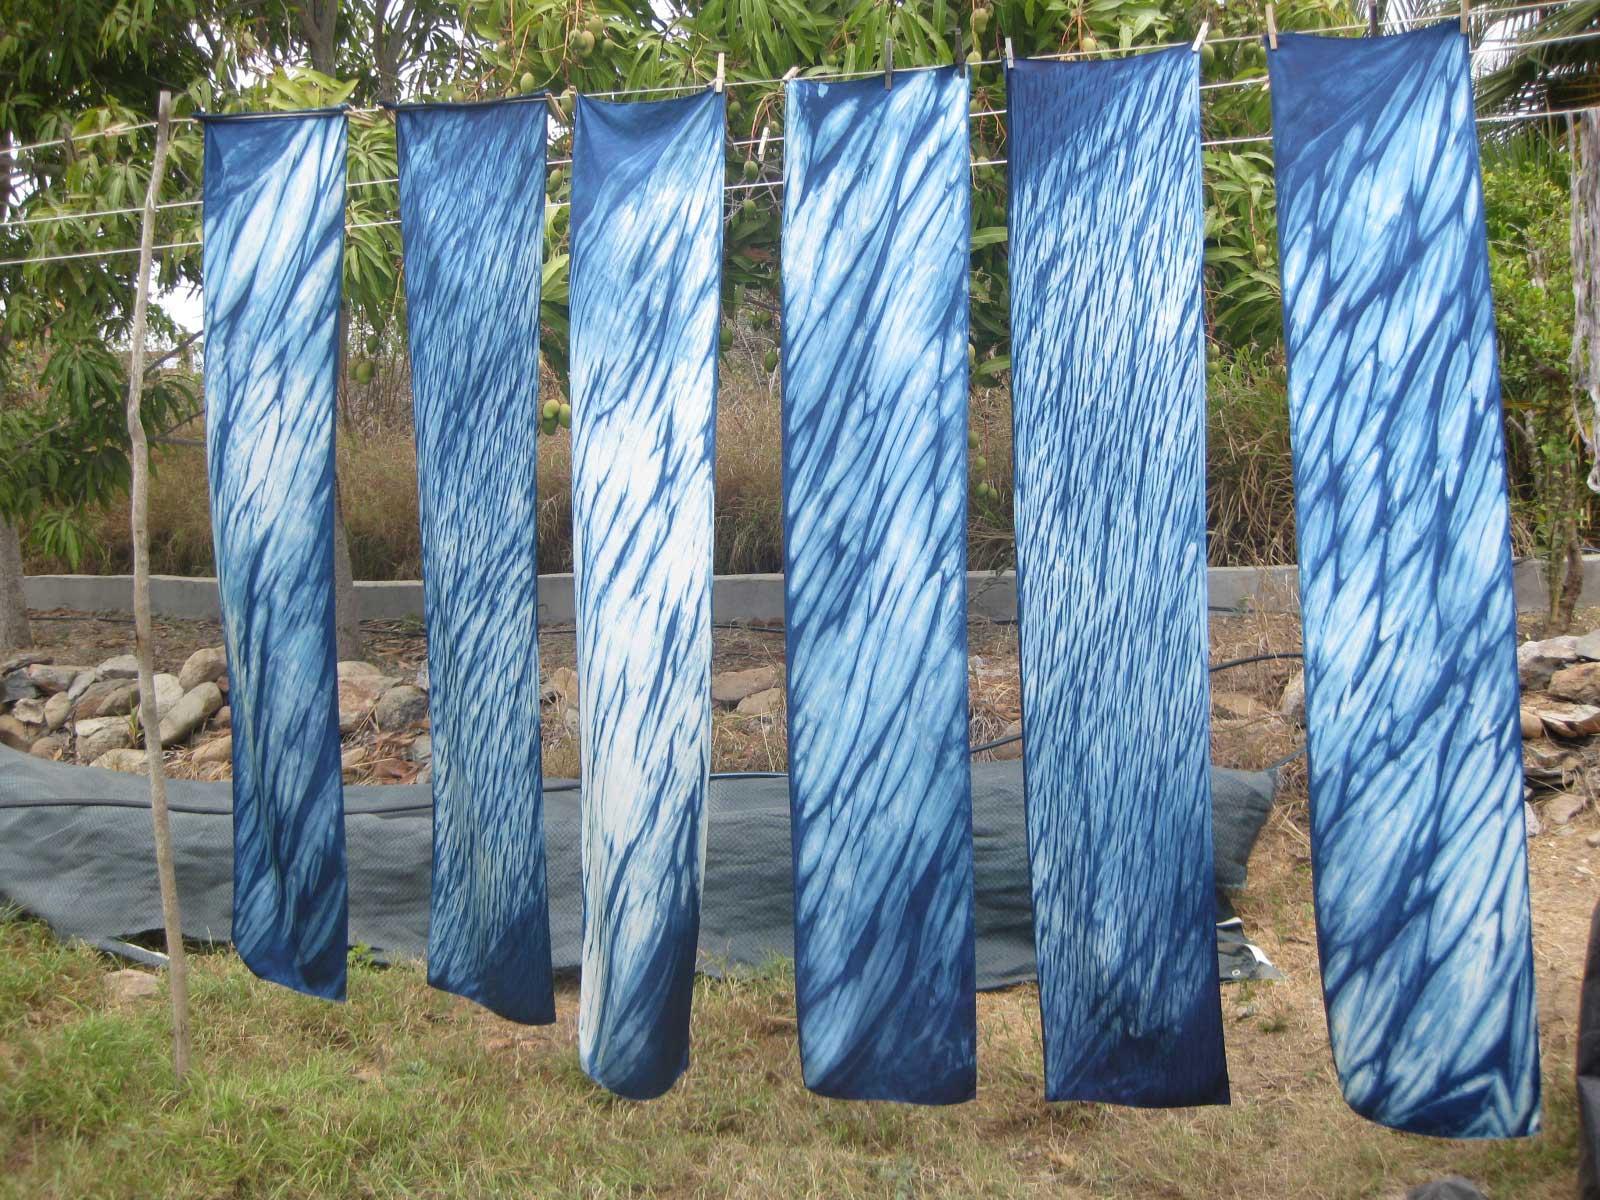 OSCC-Jason-Durland-Arashi-Shibori-Indigo-Dyed-Silk-Scarves.jpg